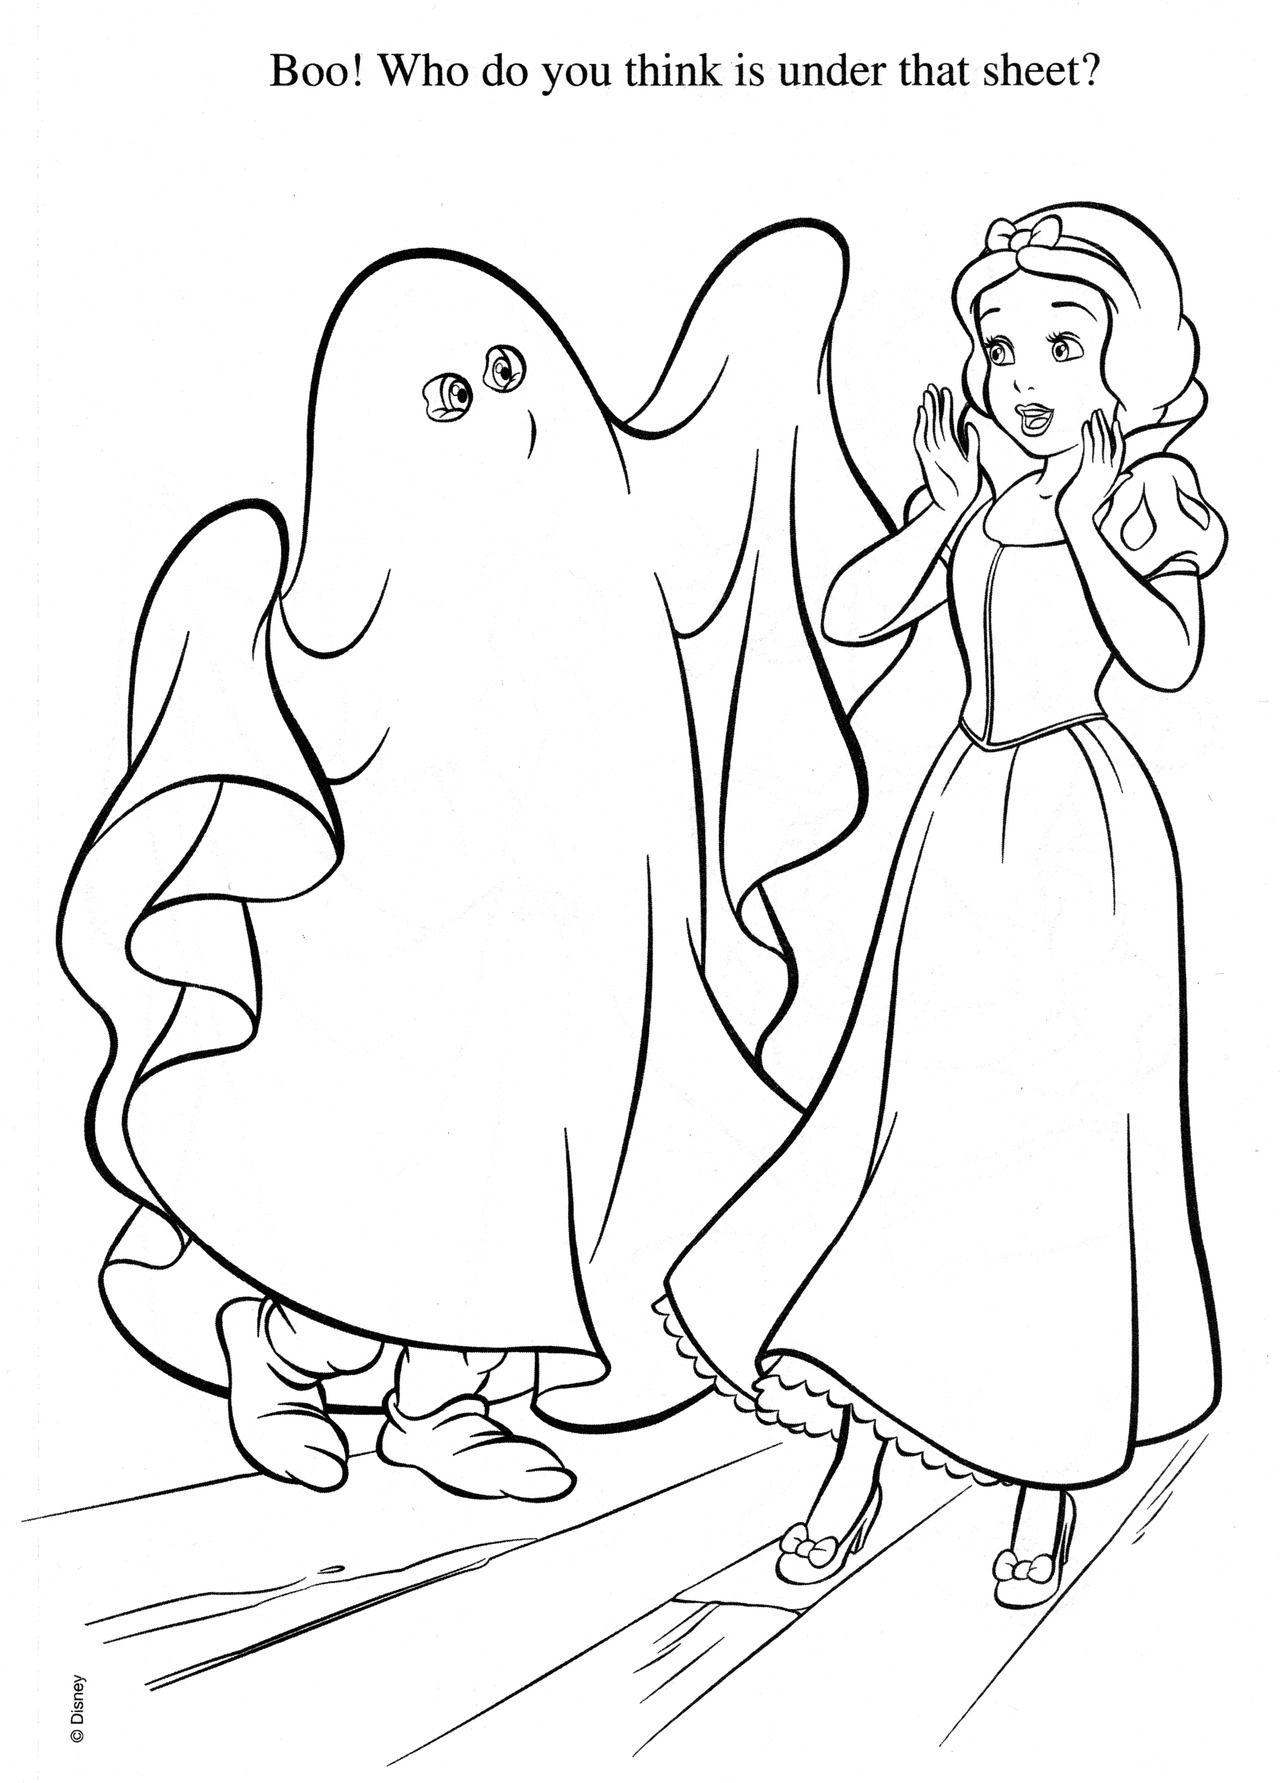 Halloween Halloween Coloring Sheets Halloween Coloring Disney Halloween Coloring Pages